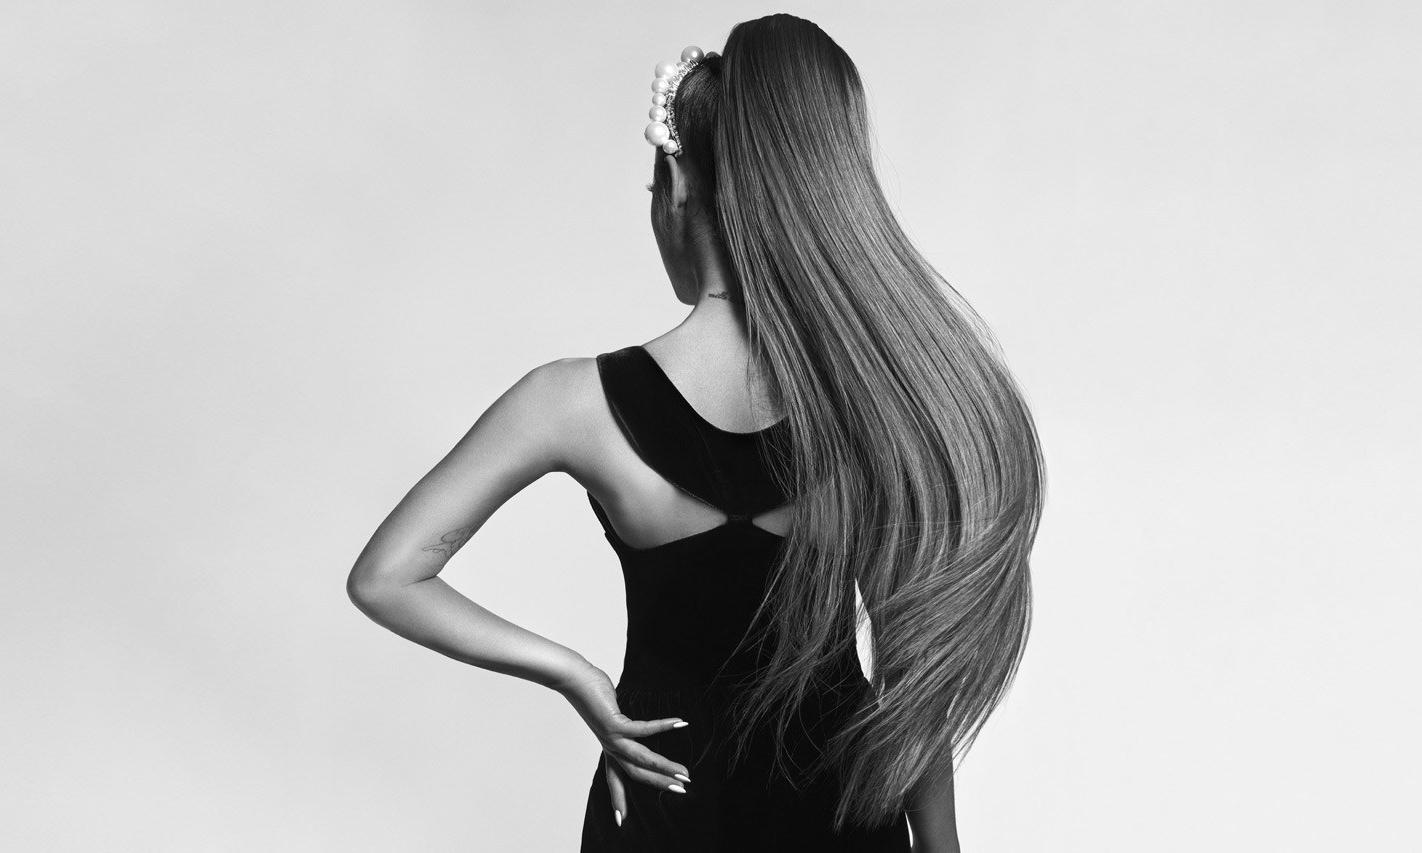 Givenchy 宣布 Ariana Grande 成品牌代言人